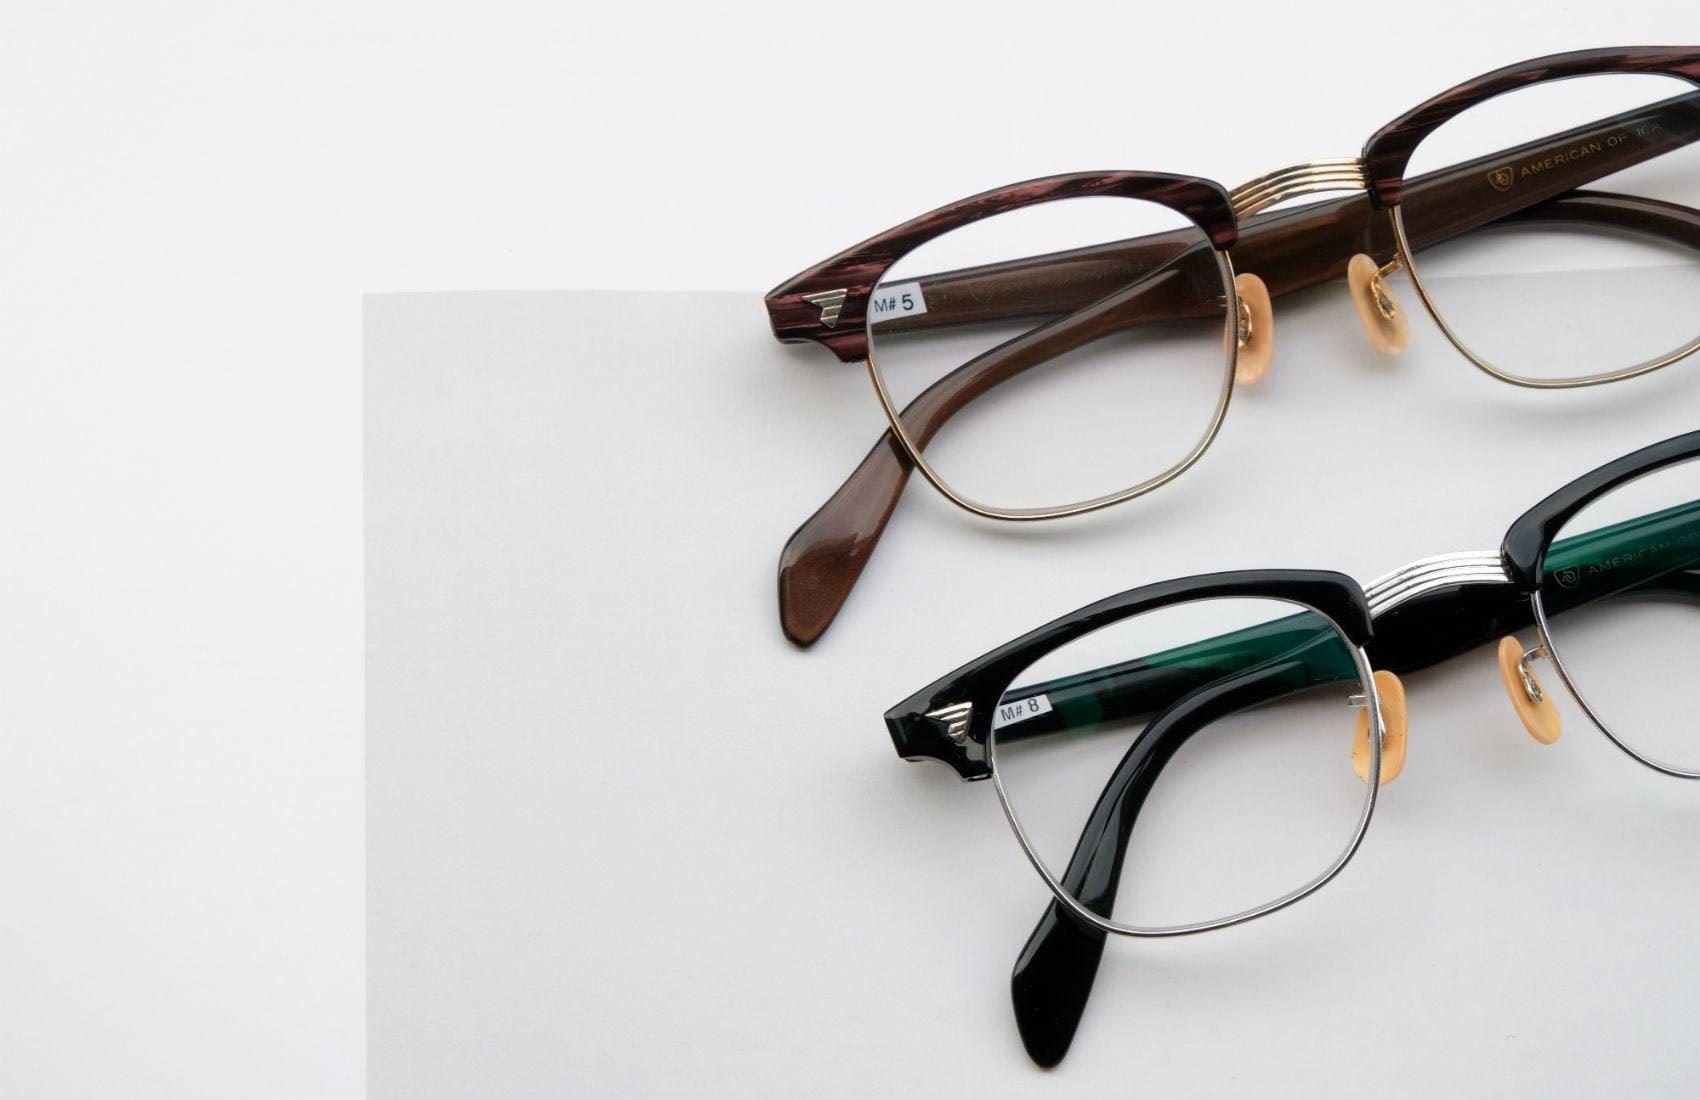 The Spectacle(RetroSpecs & Co.) Combination